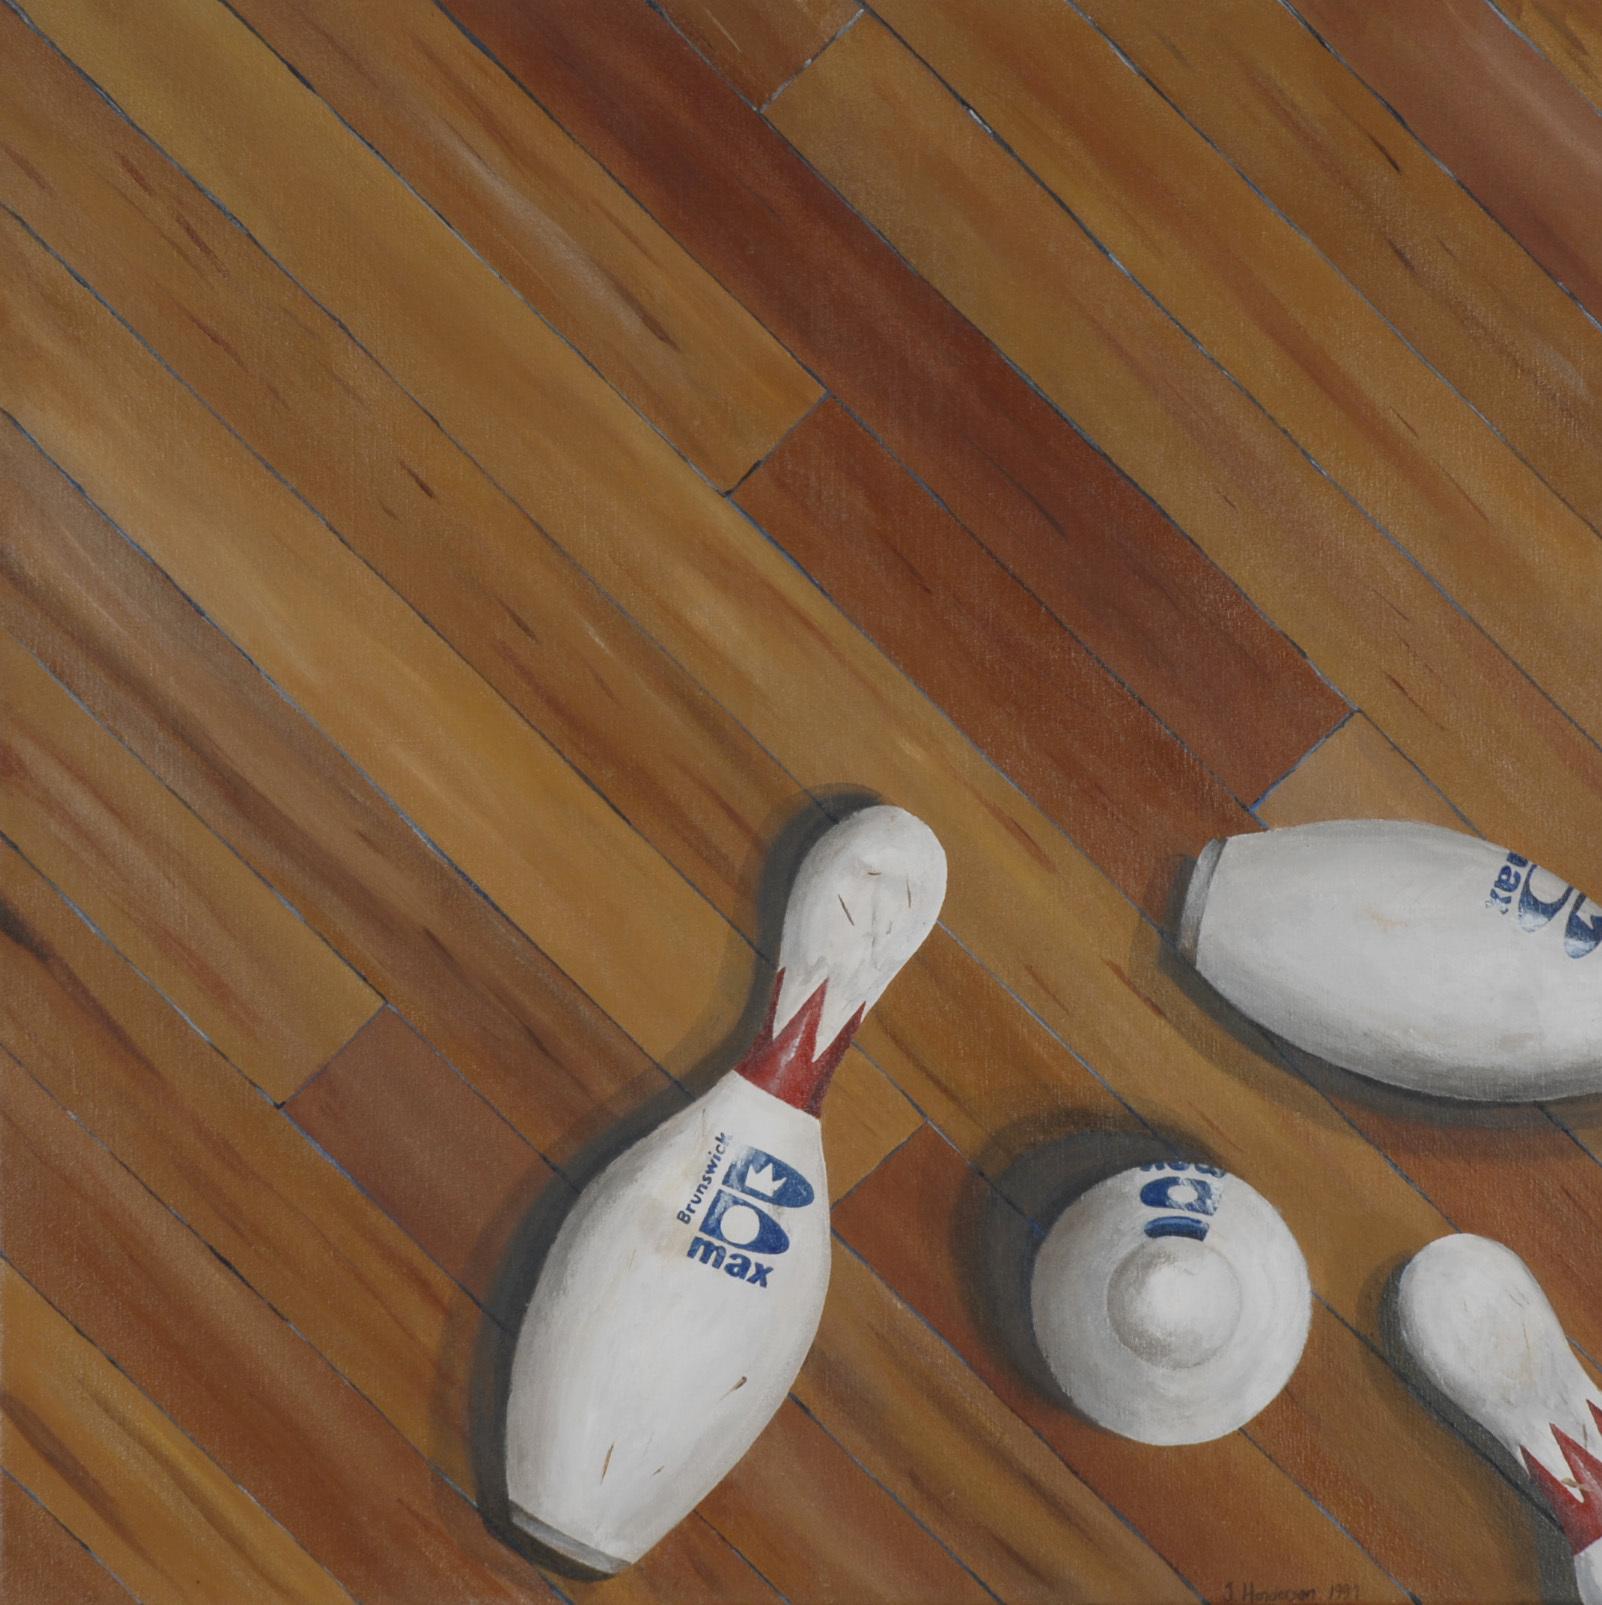 realism, bowling pins, painting, acrylic realism, photorealism, bowling